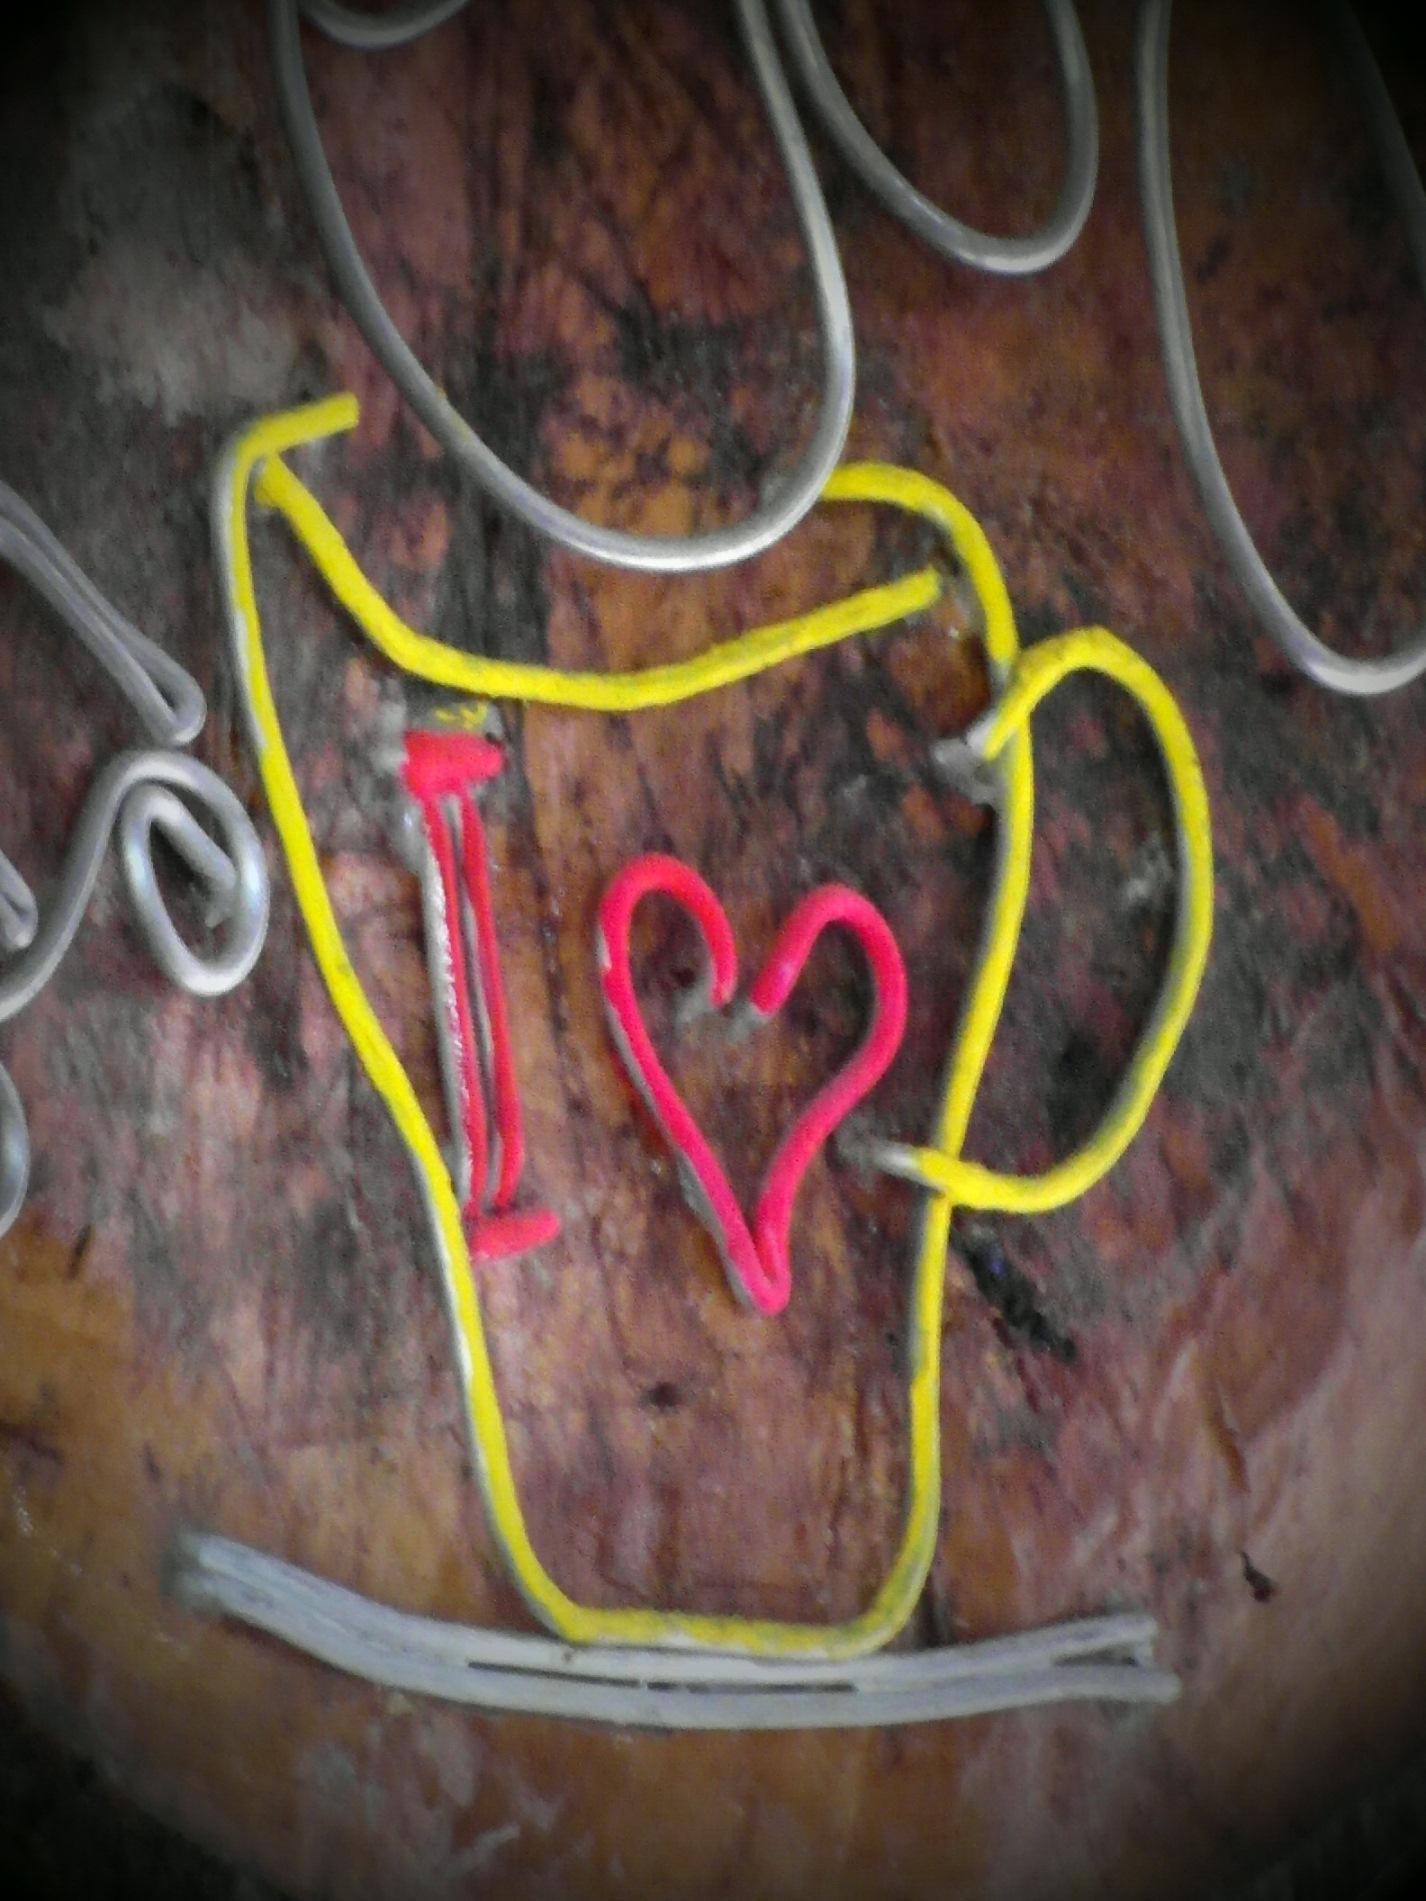 I Love Coffee Sign, Artisan, Bamboo, Cafe, Coffee, HQ Photo